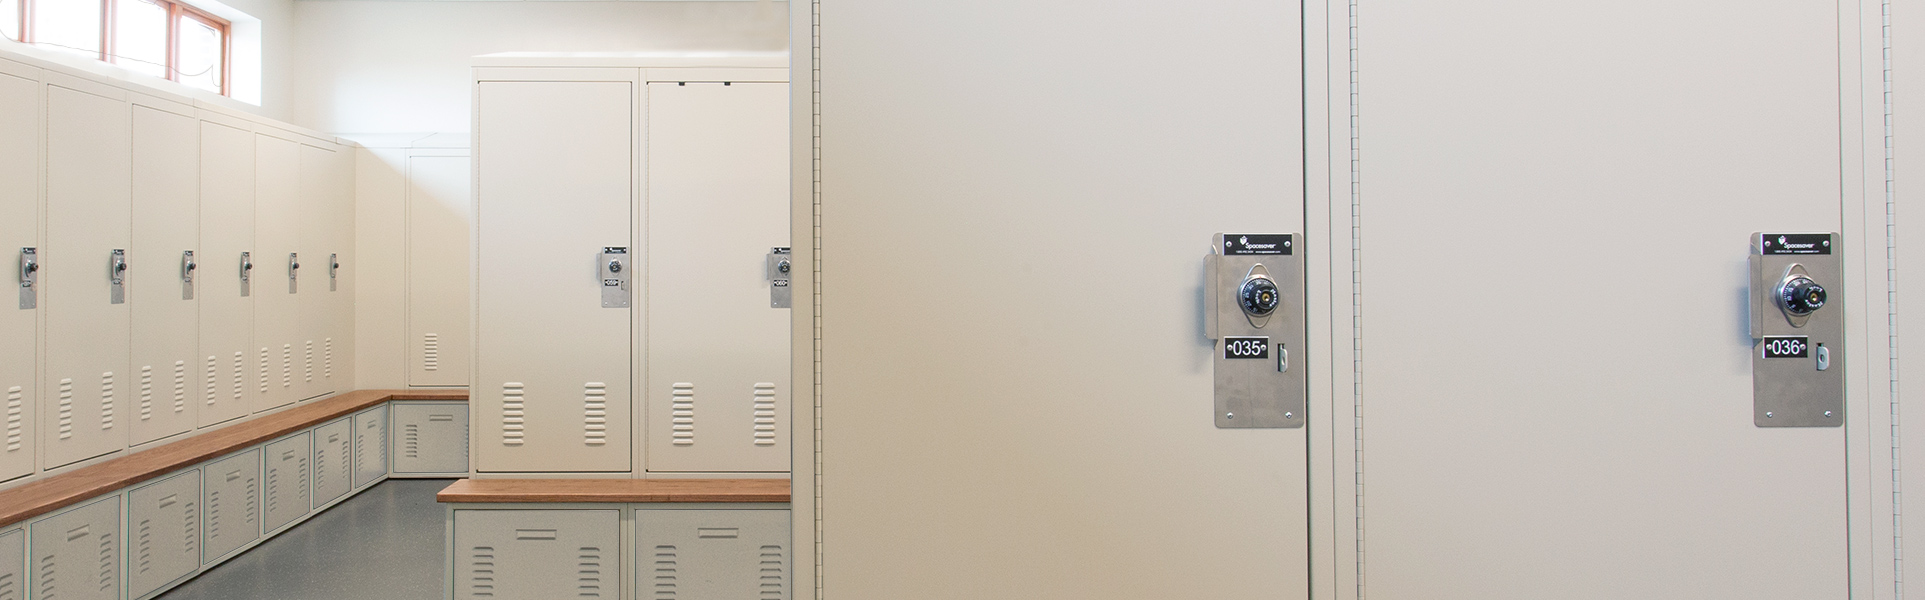 healthcare locker room personal locker storage